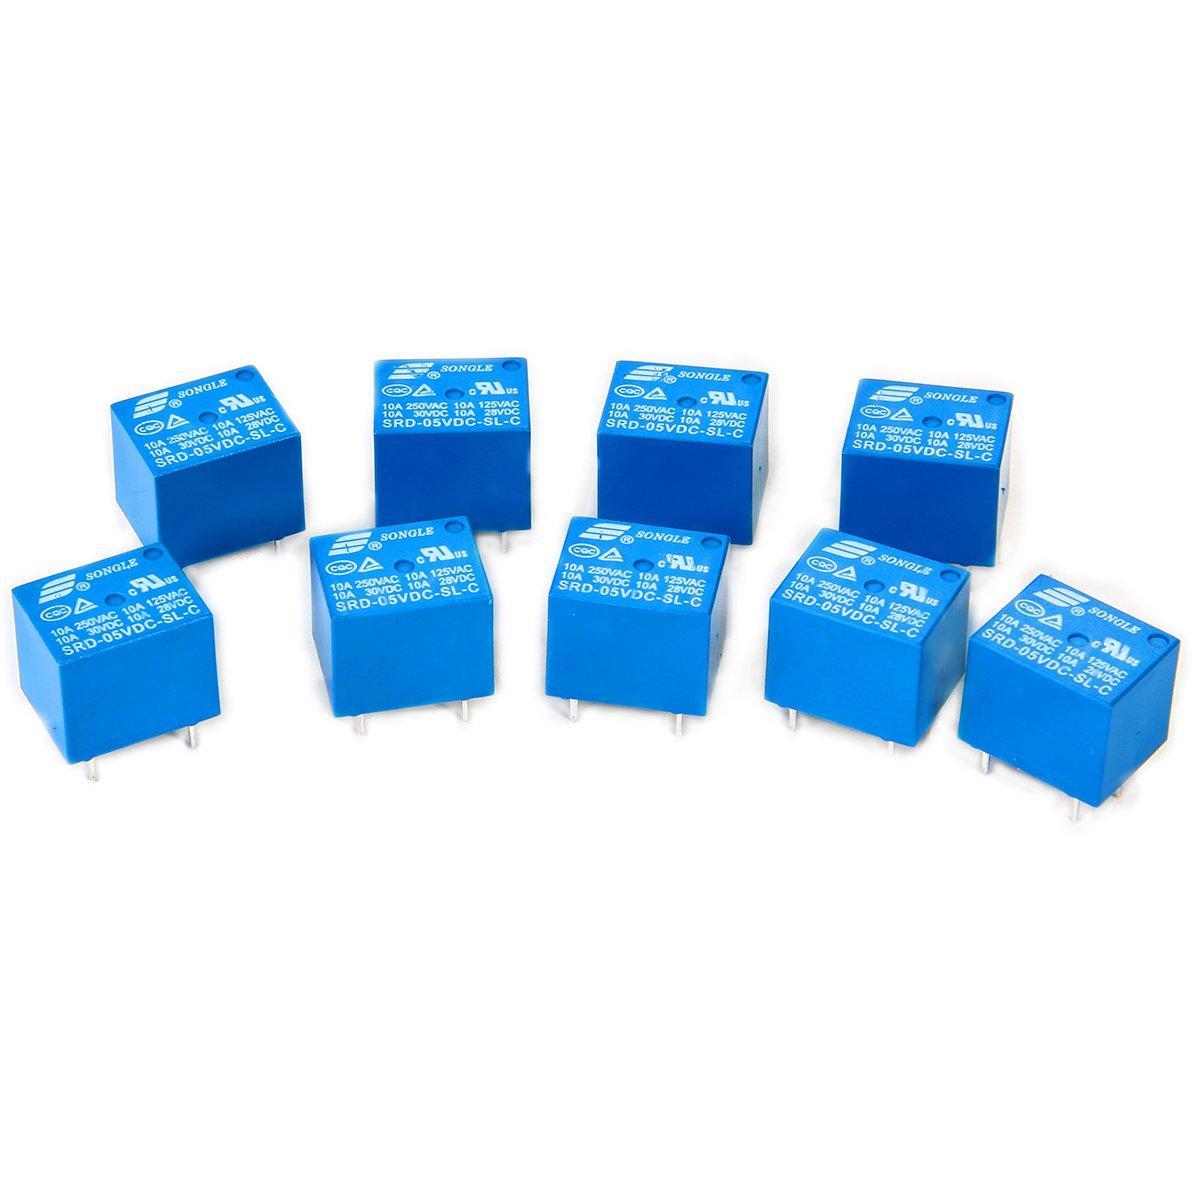 SONGLE relé Electromagnético de Alimentación SPDT 12V 10A Montaje - Pin para PCB, 10 Unidades, Control Aplicaciones Electrodomésticos BI084 Control Aplicaciones Electrodomésticos BI084